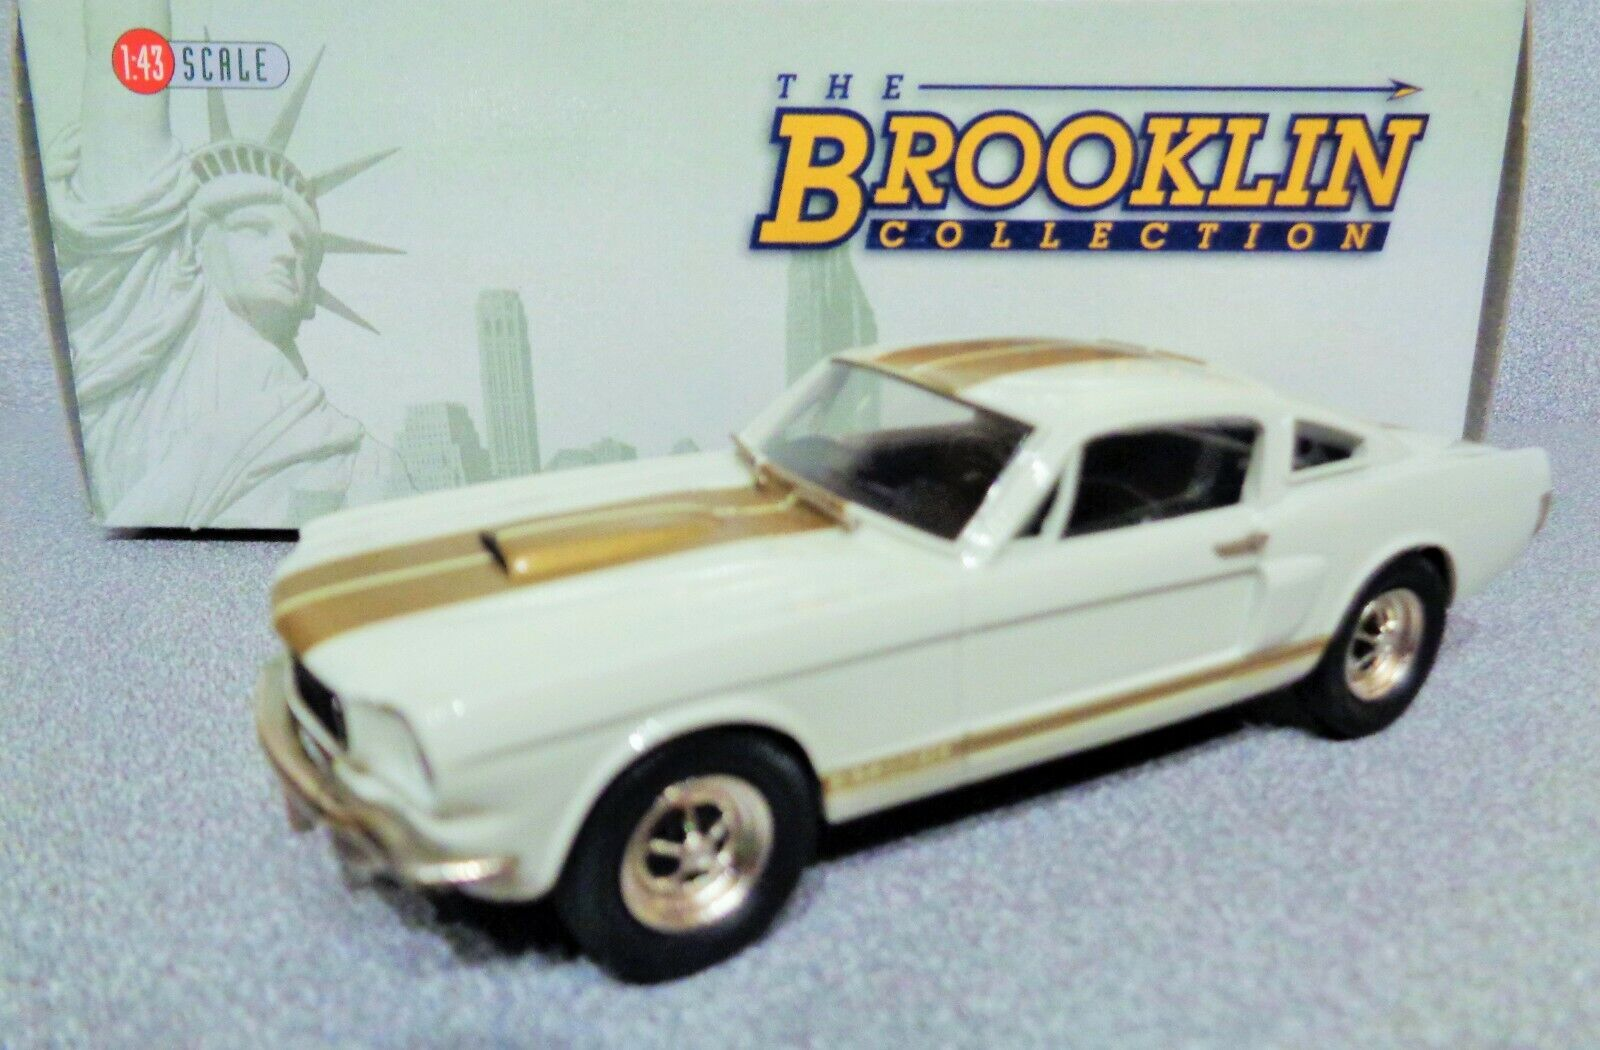 Modelo de Brooklyn 1  43 frenos 124x 1966 Ford Mustang gt350 - H  blancoo  raro ¡Modelo de Brooklyn 1  43 frenos 124x 1966 Ford Mustang gt350 - H  blancoo  raro